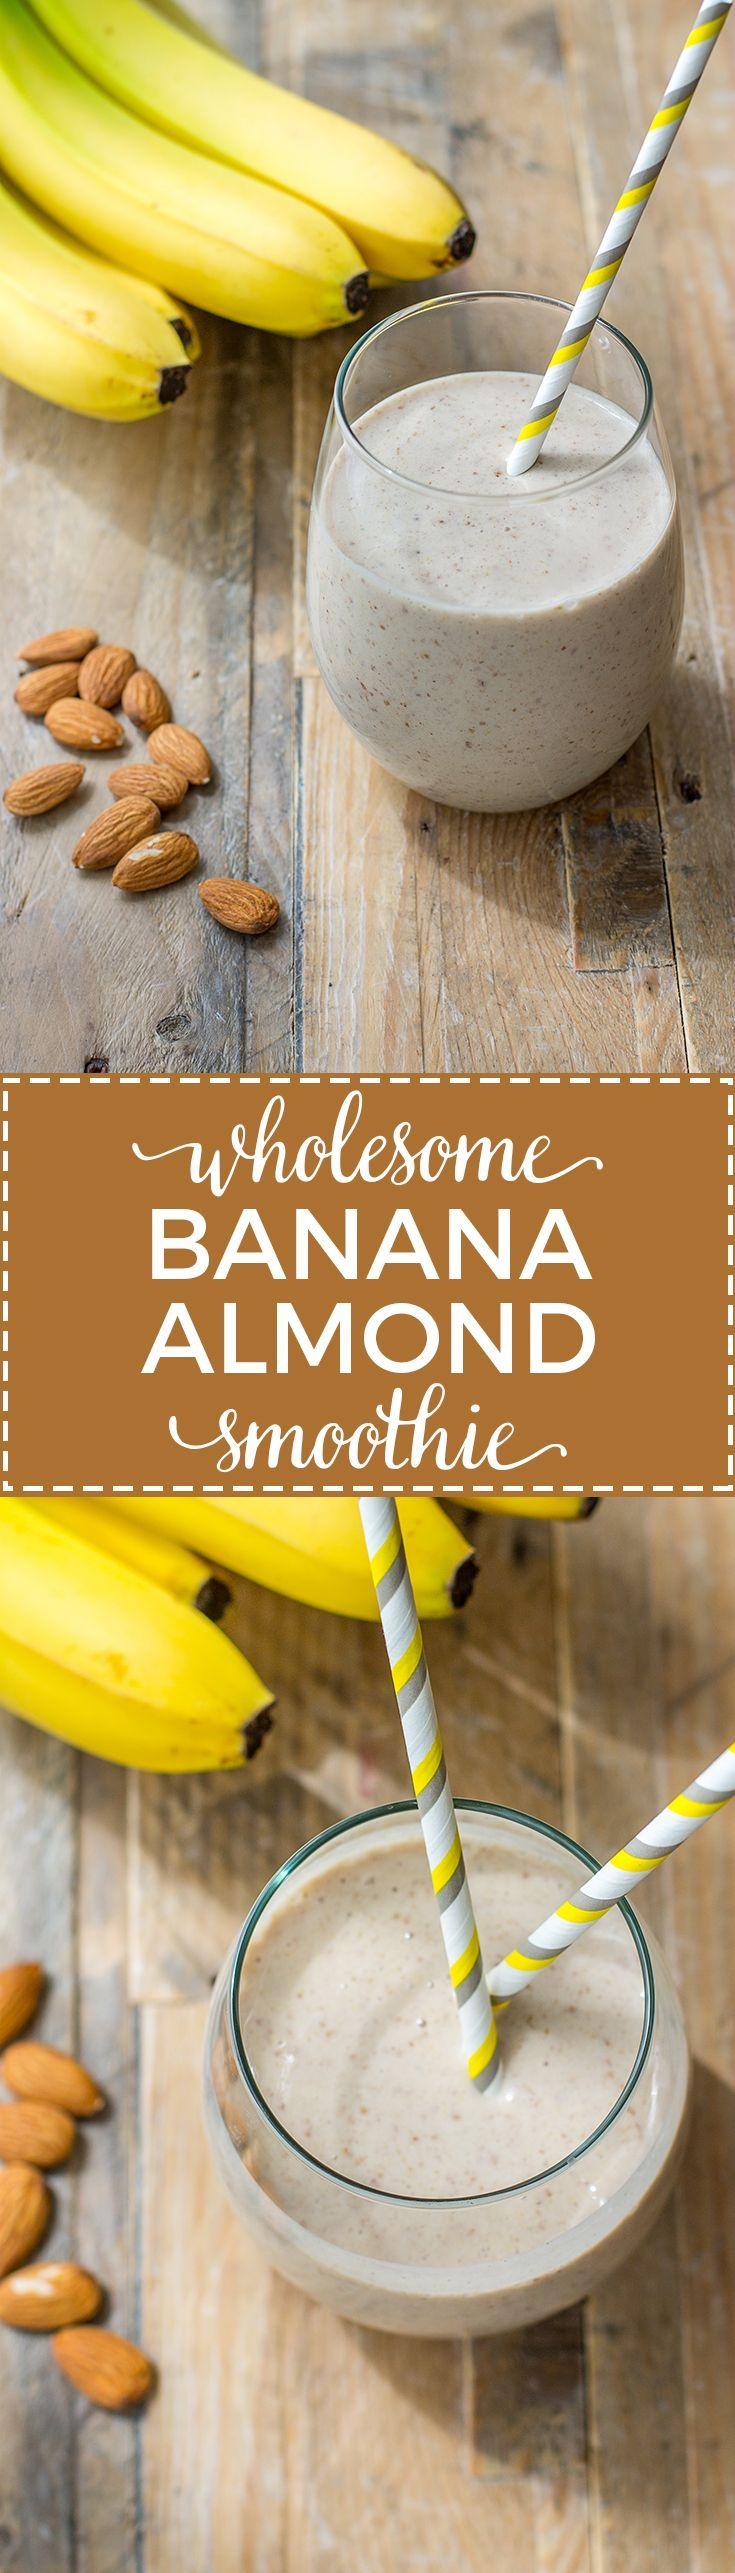 Wholesome banana almond milk smoothie with flax seeds, vanilla, and cinnamon. Like a healthy milkshake! #smoothierecipes #almondmilk